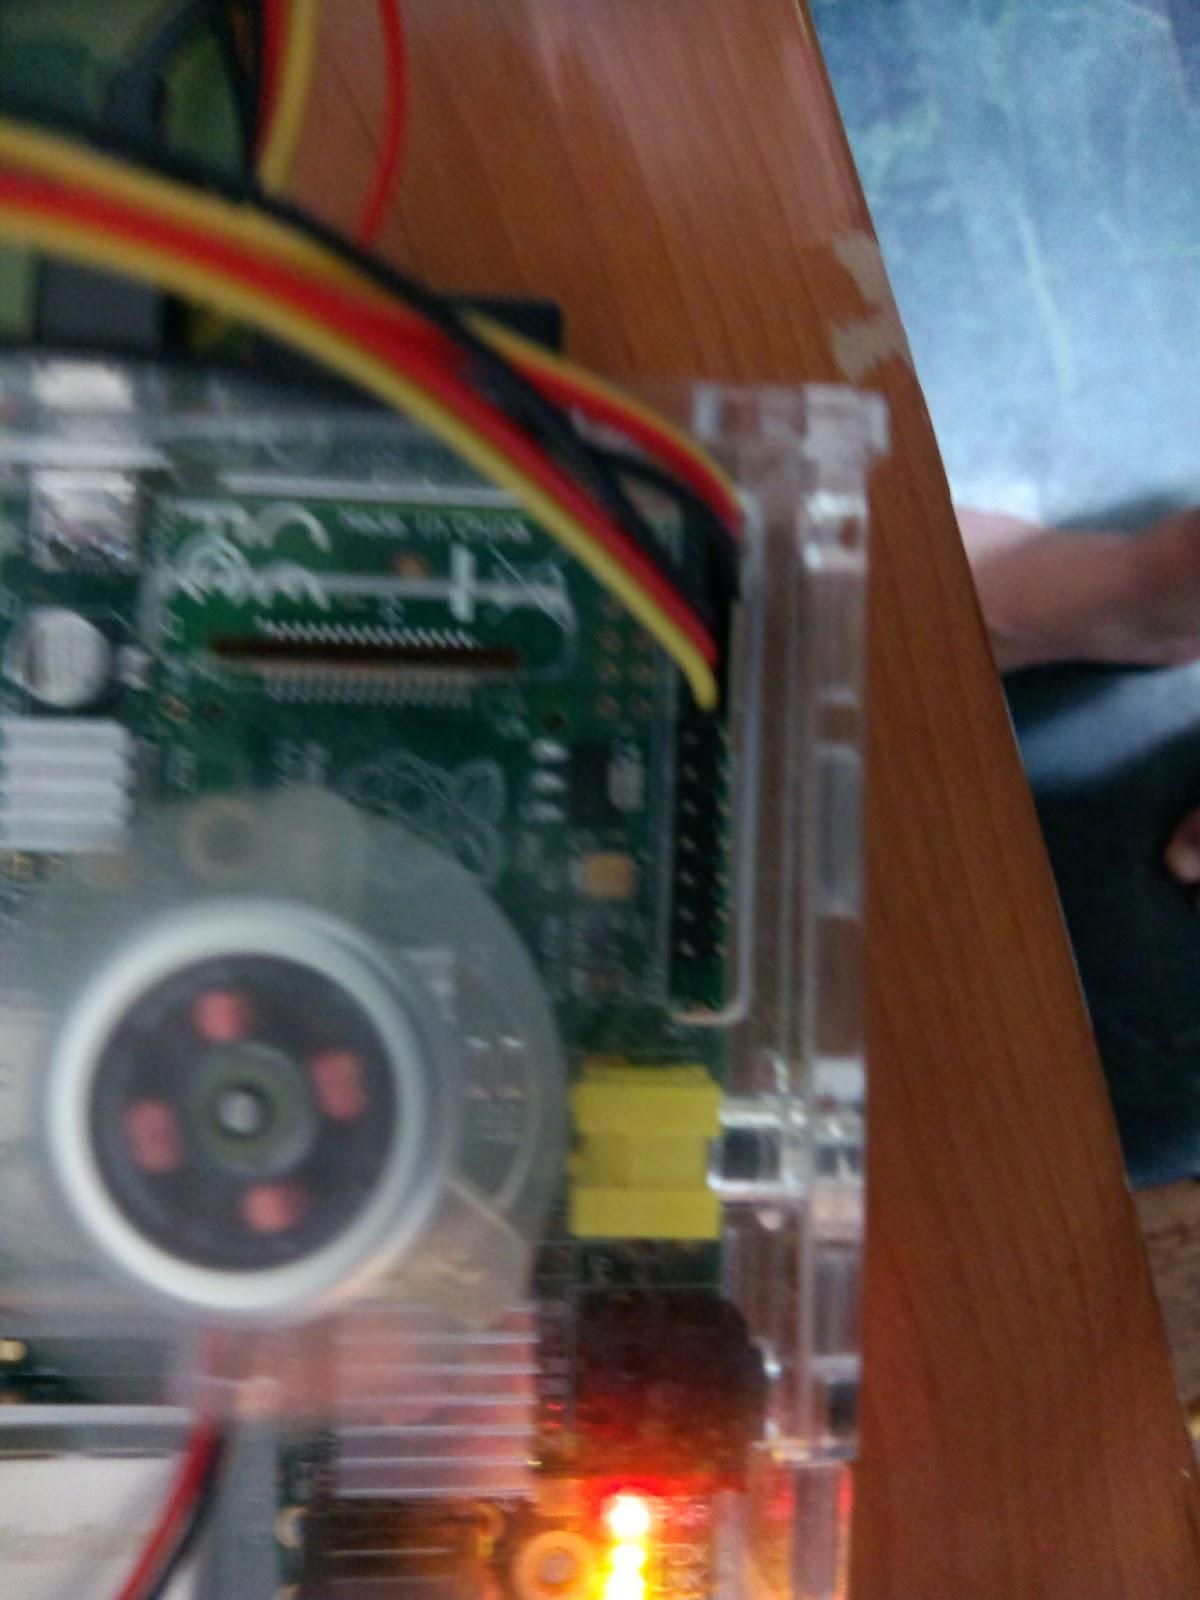 Install Wiringpi Library Experience Of Wiring Diagram On Raspberry Pi B Jimmy U7684 U5de5 U4f5c U5ba4 Read Mpu6050 U9640 U87ba U5100 U8cc7 U6599 Use Gpio Pinout Git